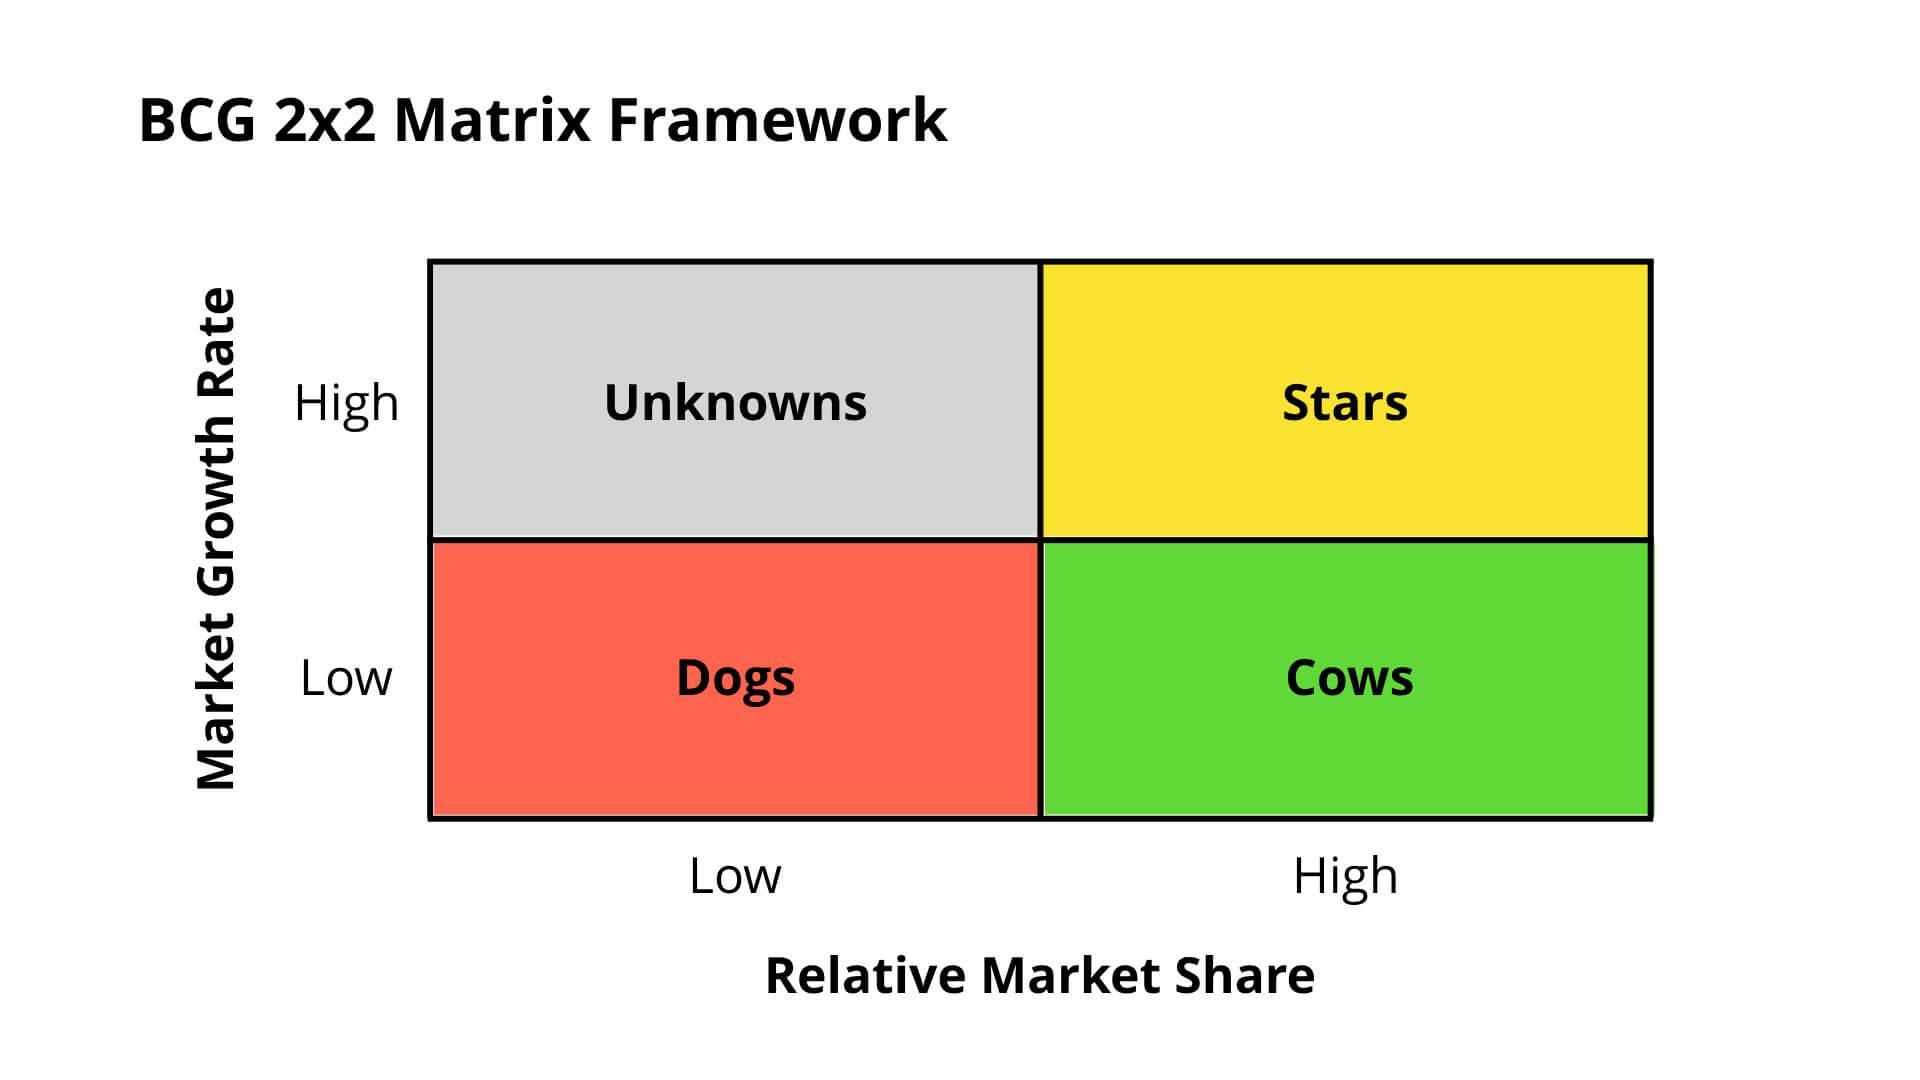 BCG 2x2 Matrix Framework